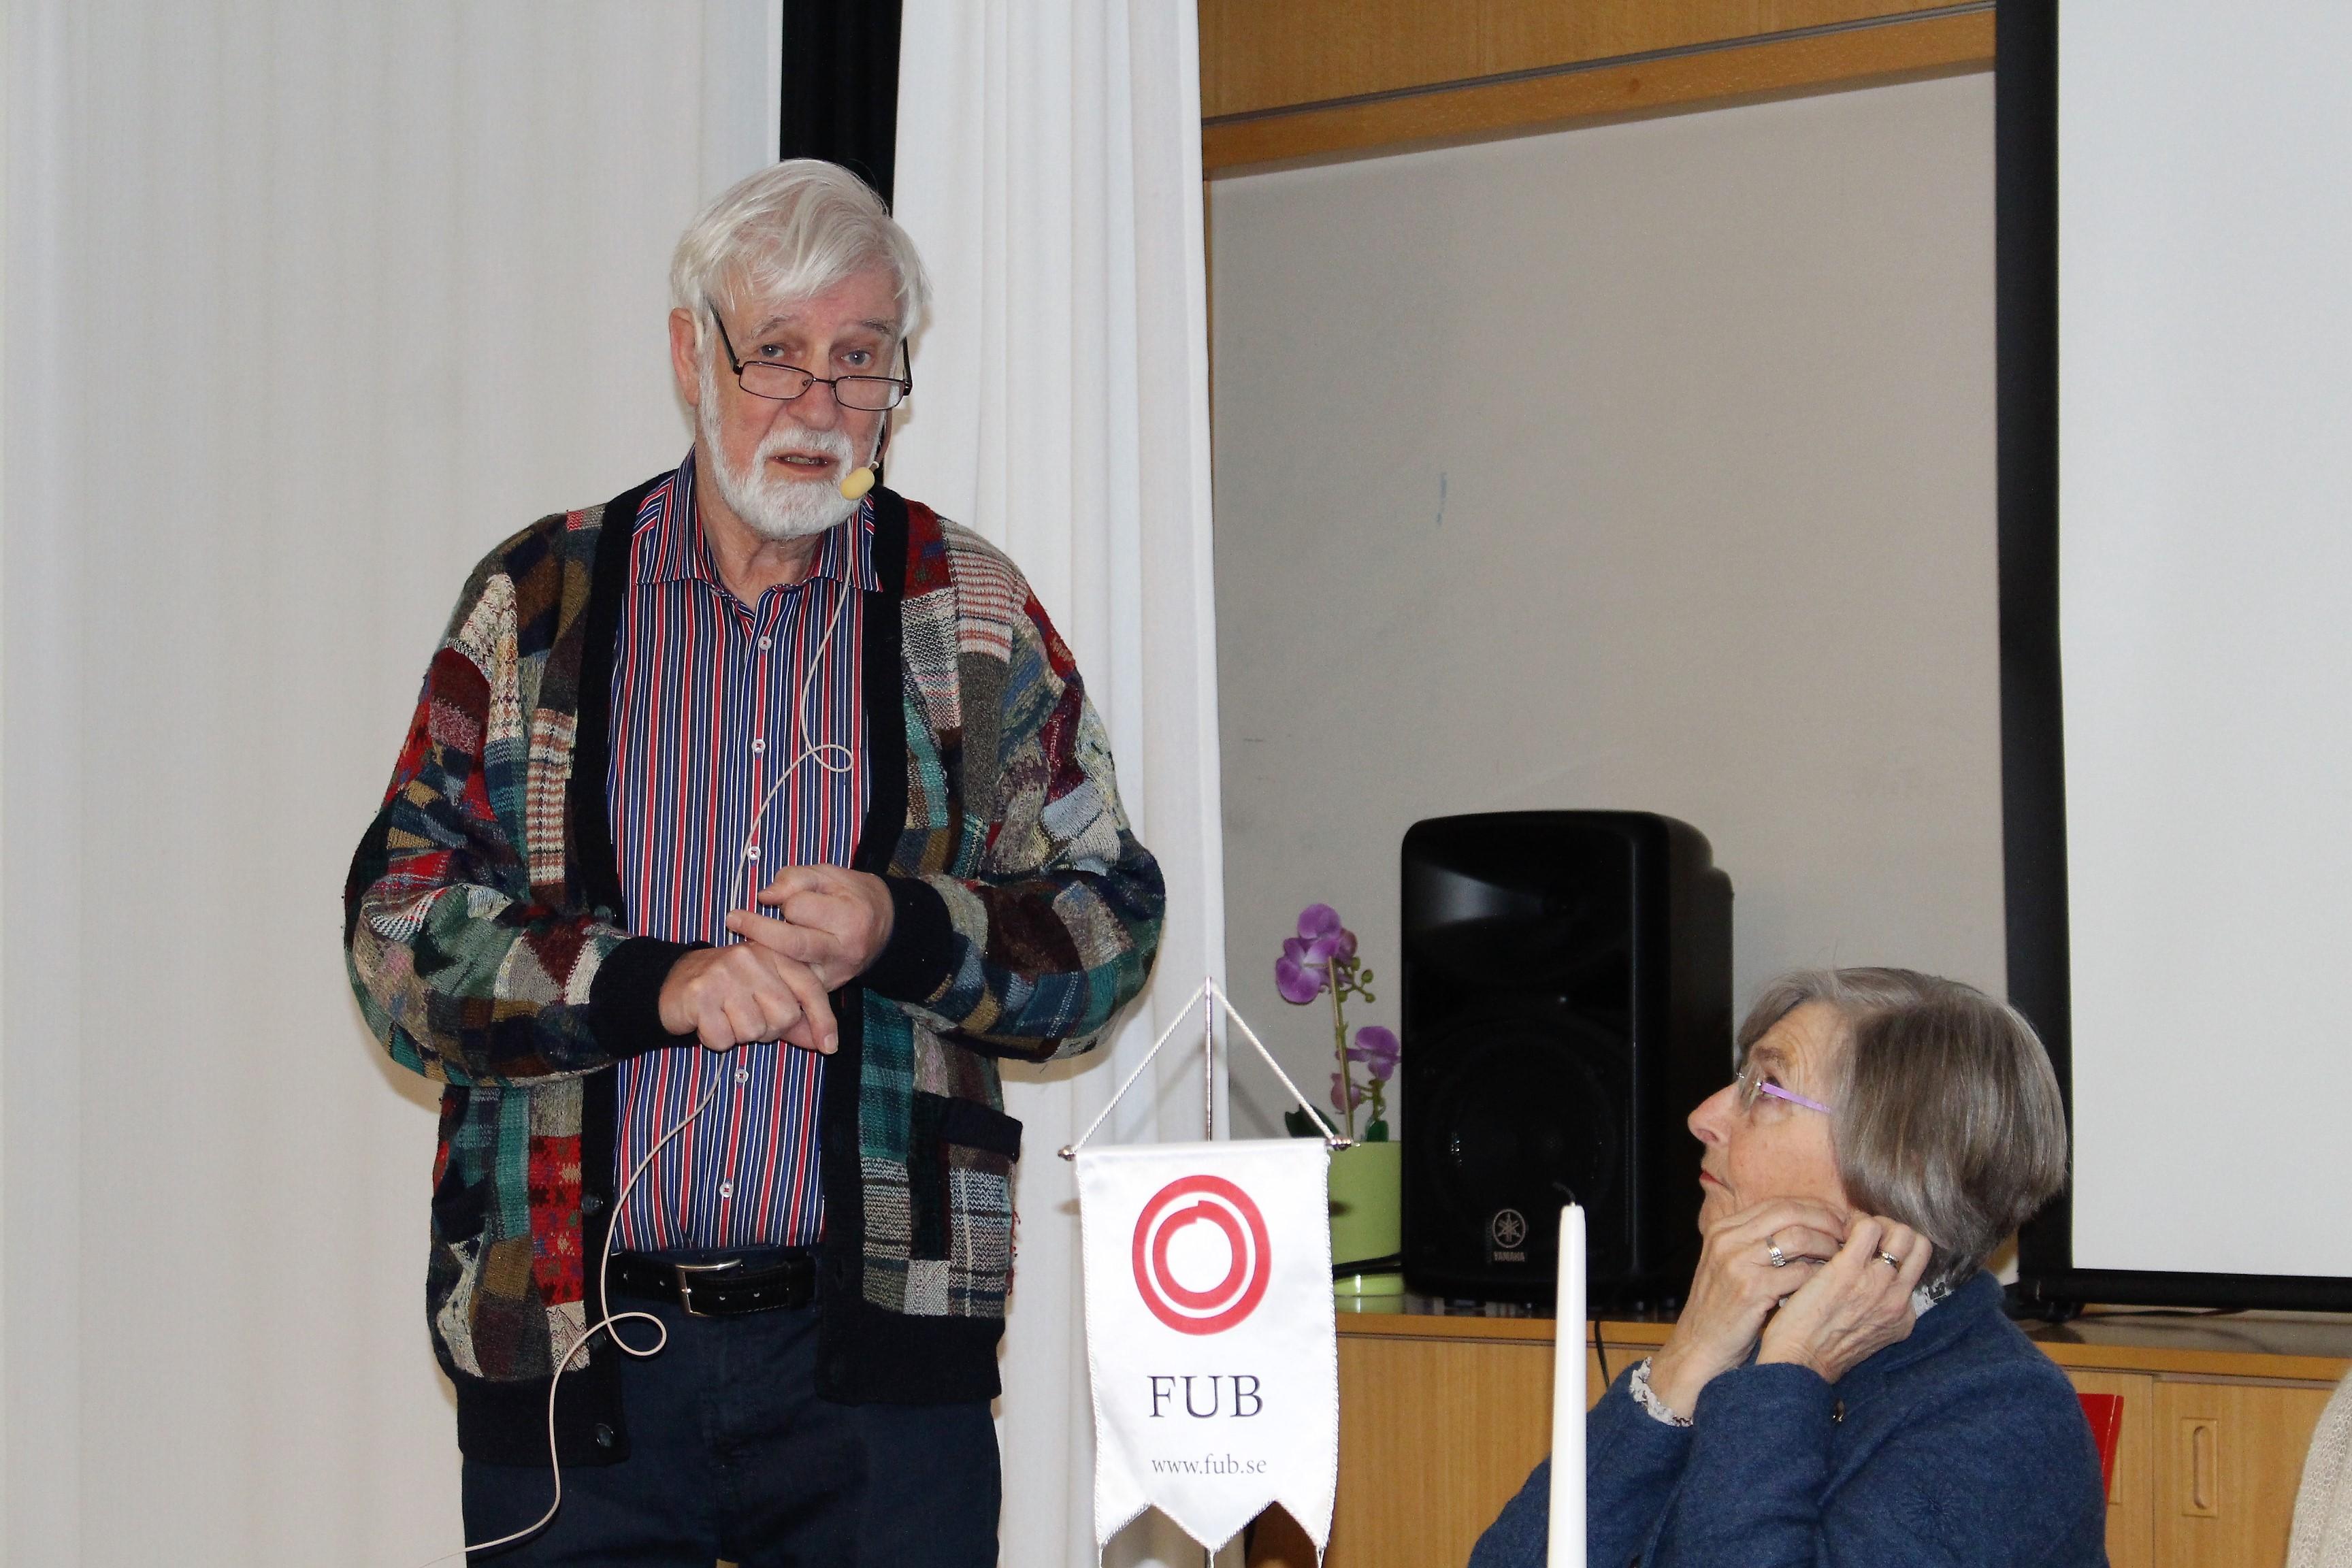 Bengt Rudqvist